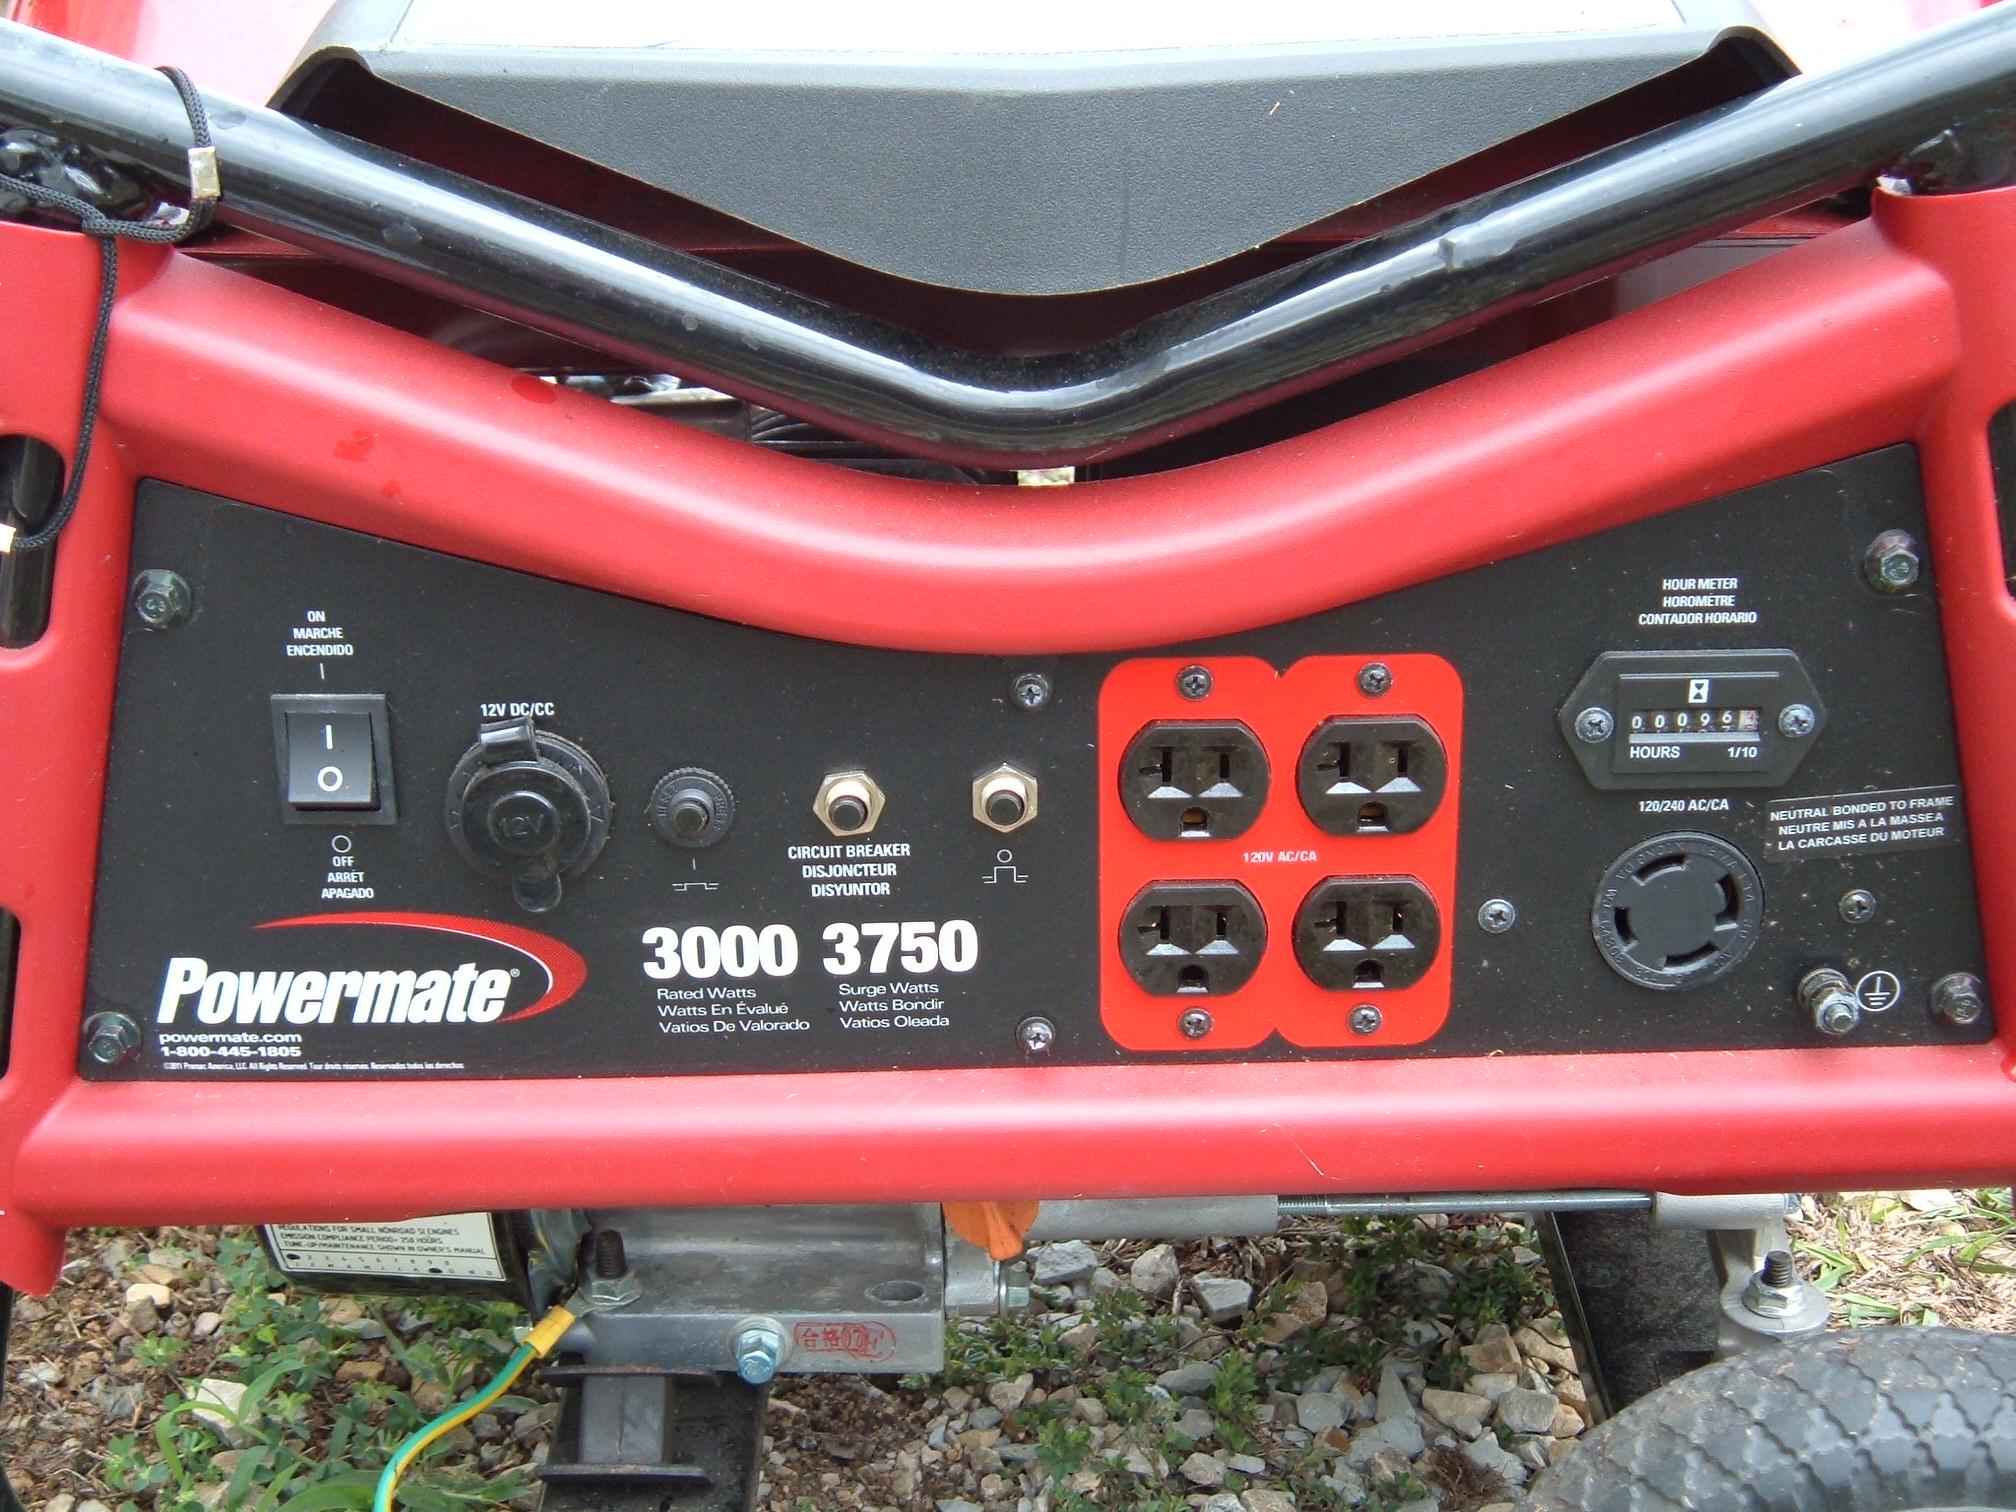 Loanables Powermate 3000 Watt Generator Rental Located In